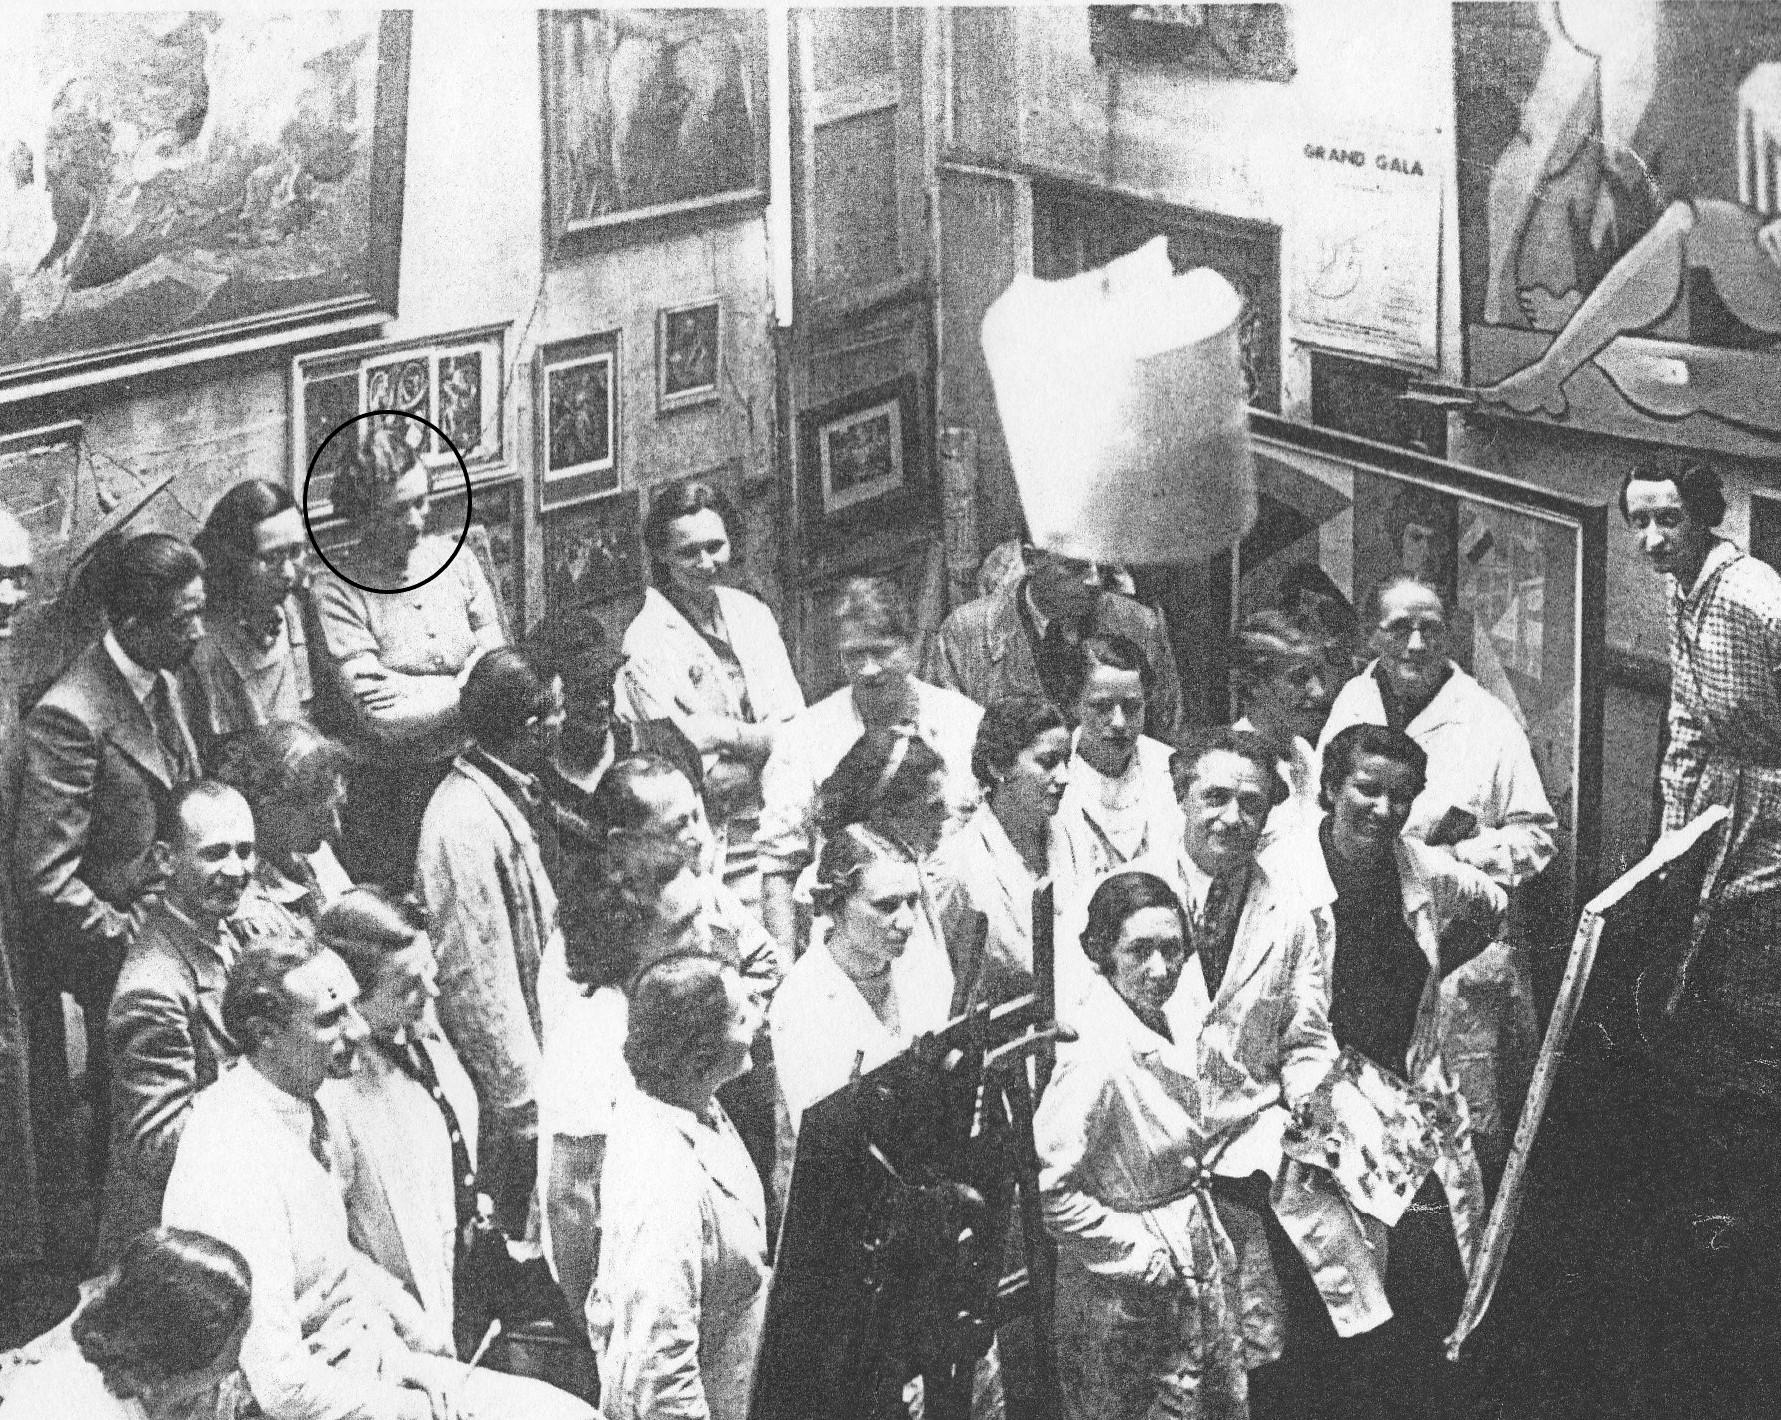 Julie en classe d'examen Académie des arts visuels, La Haye (1923)